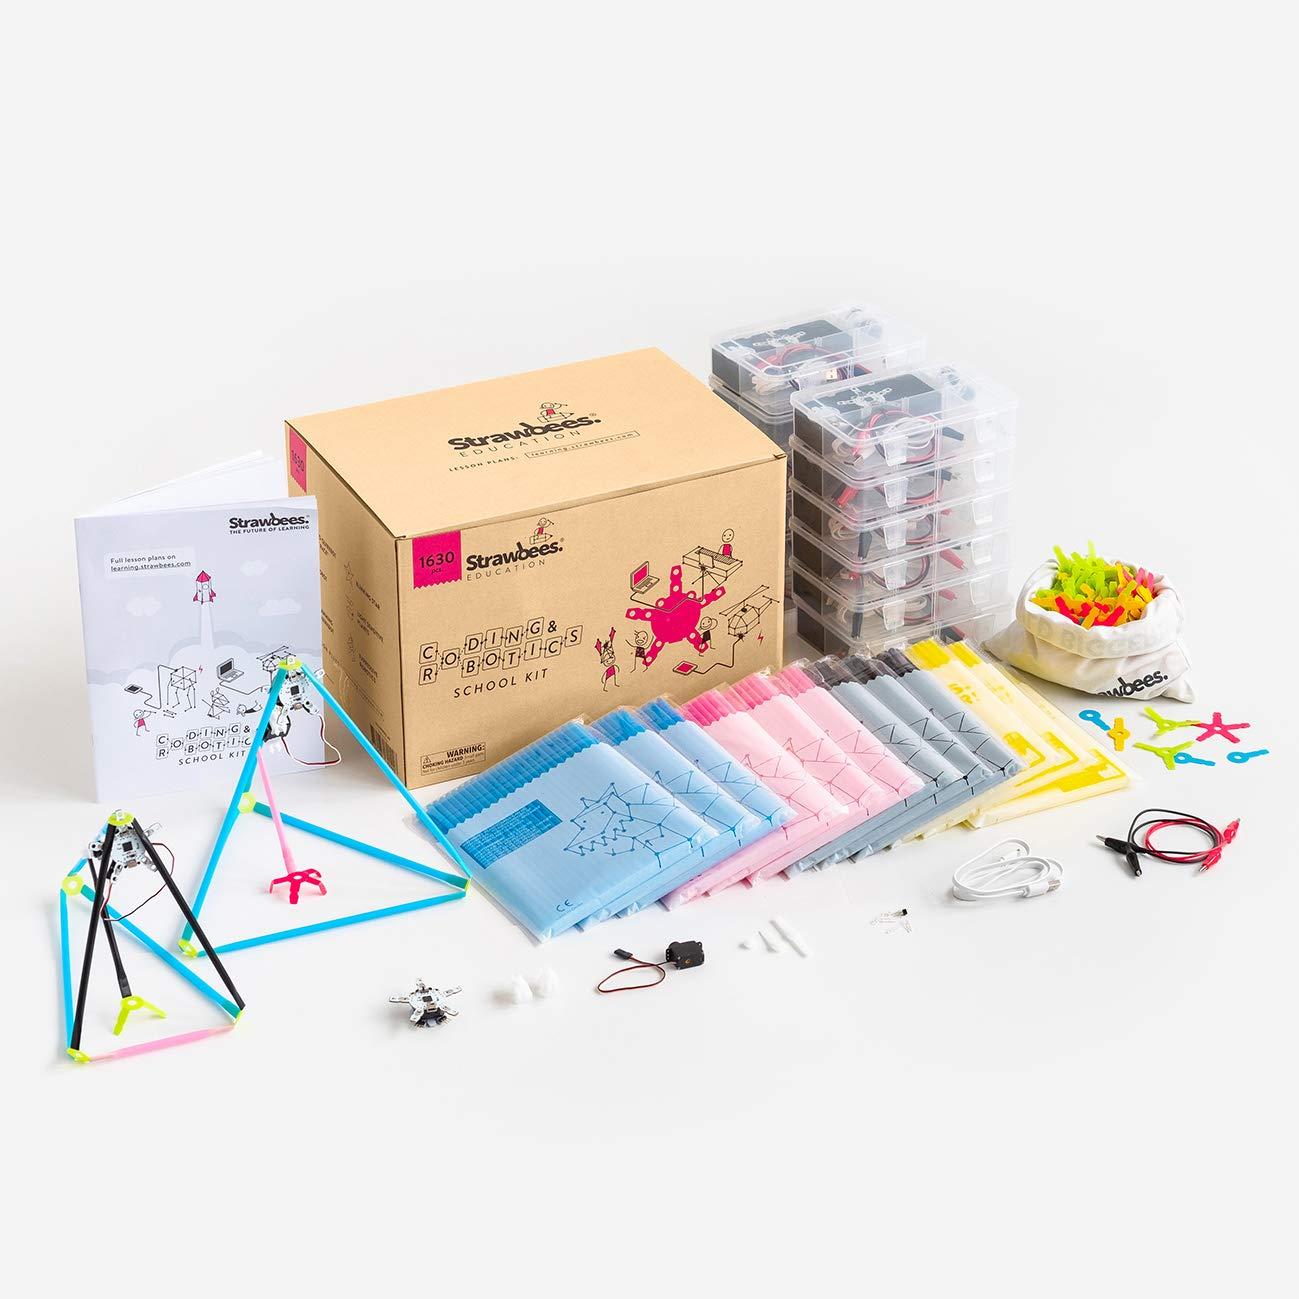 Strawbees Coding & Robotics Kit STEM Building and Programming School Kit